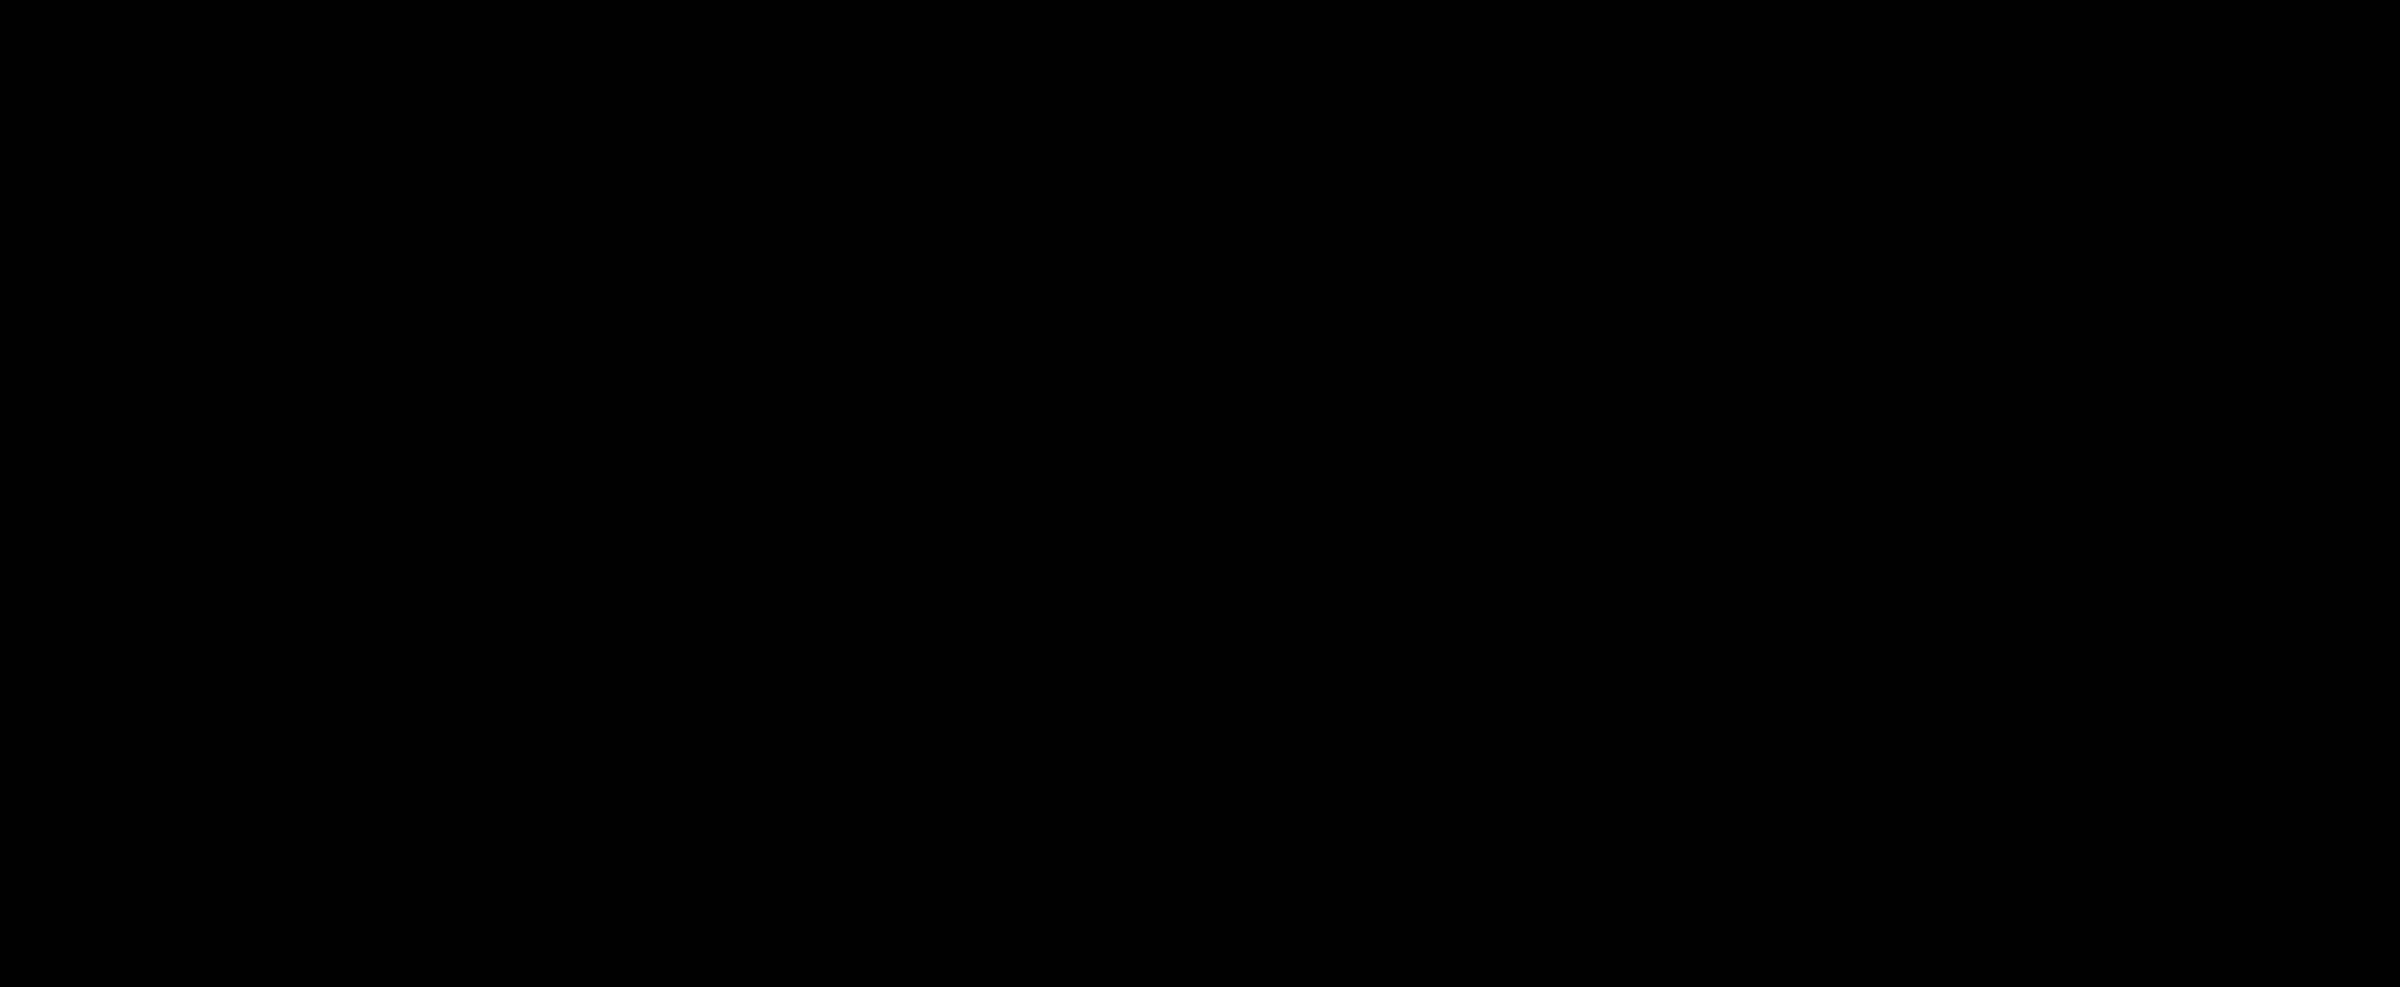 vector transparent download Slug Icons PNG